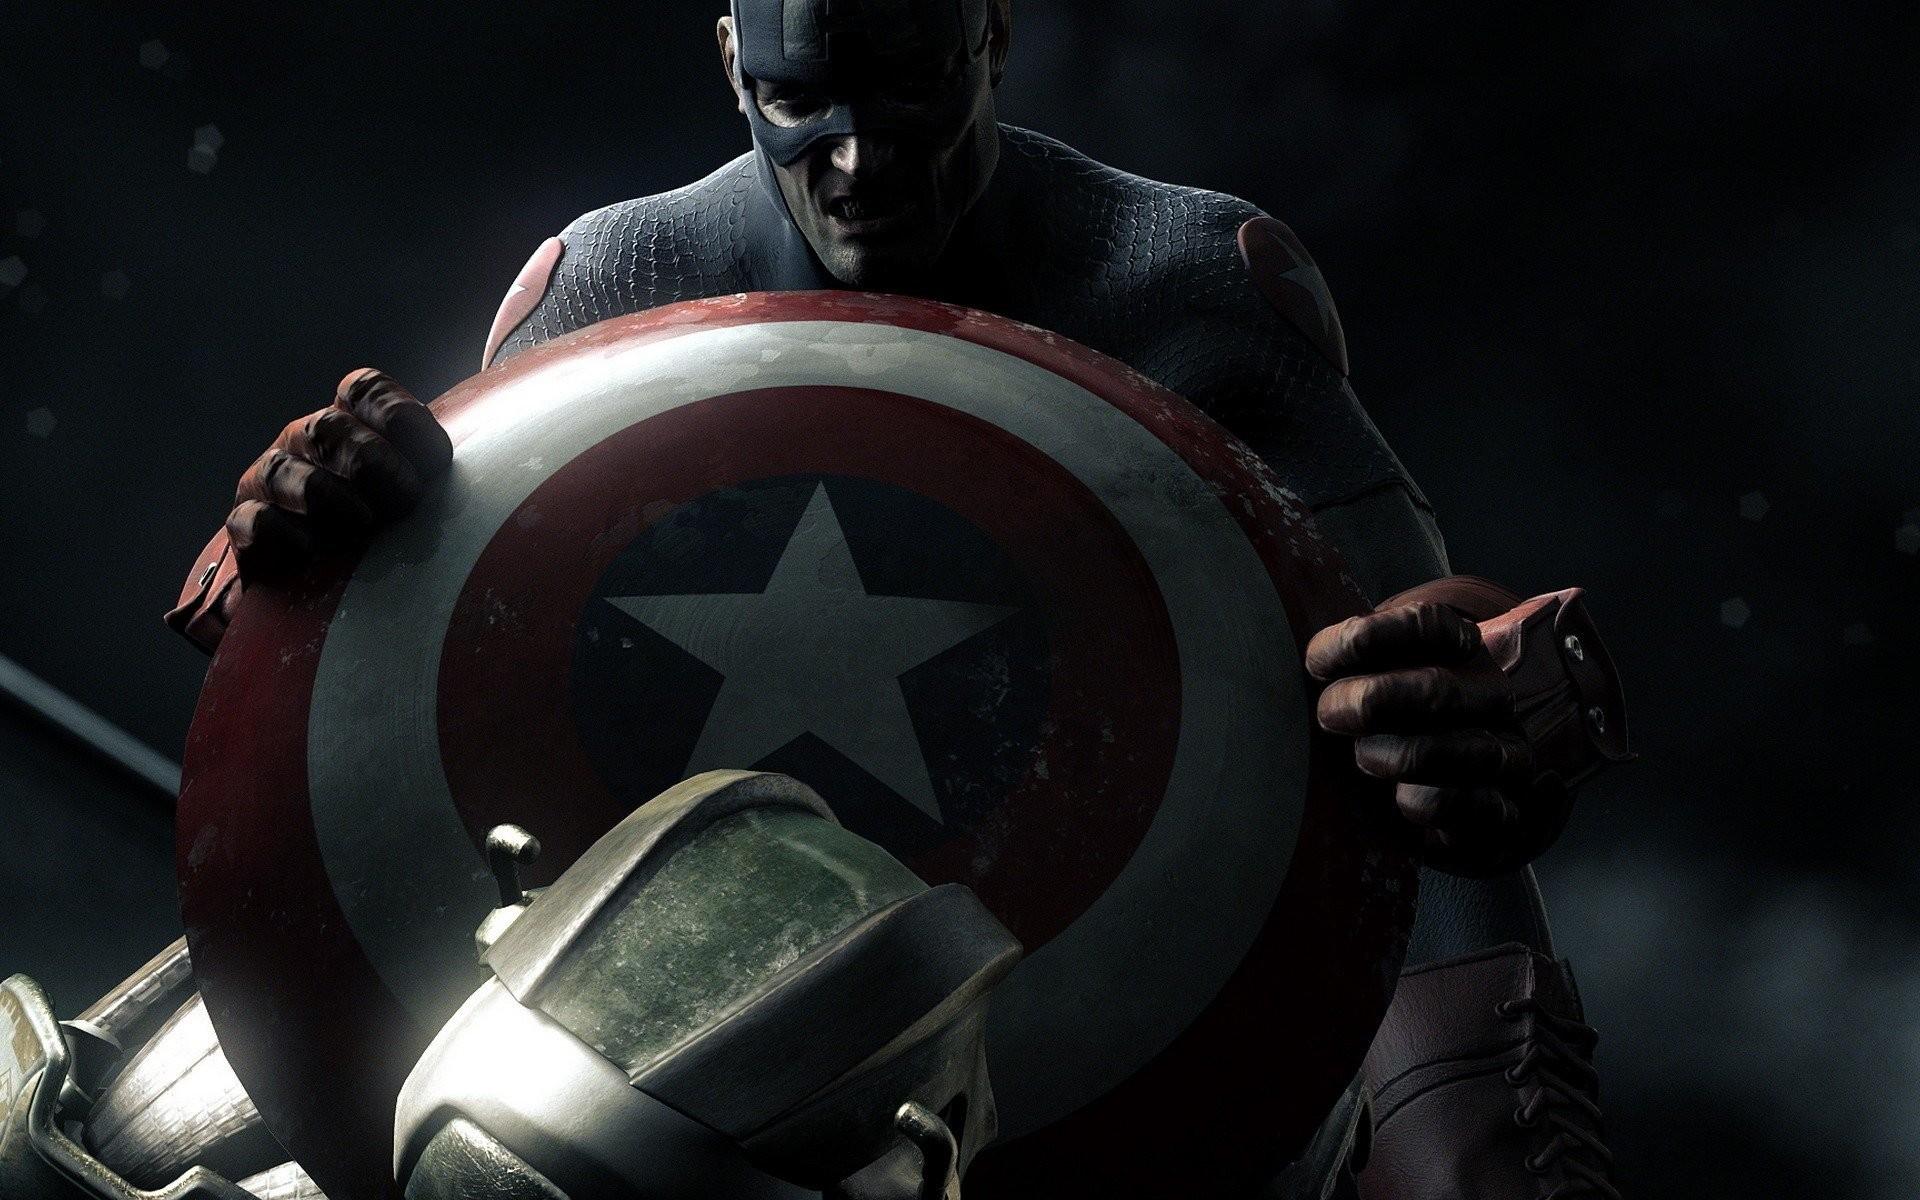 Captain america shield wallpapers 69 images - Captain america screensaver download ...